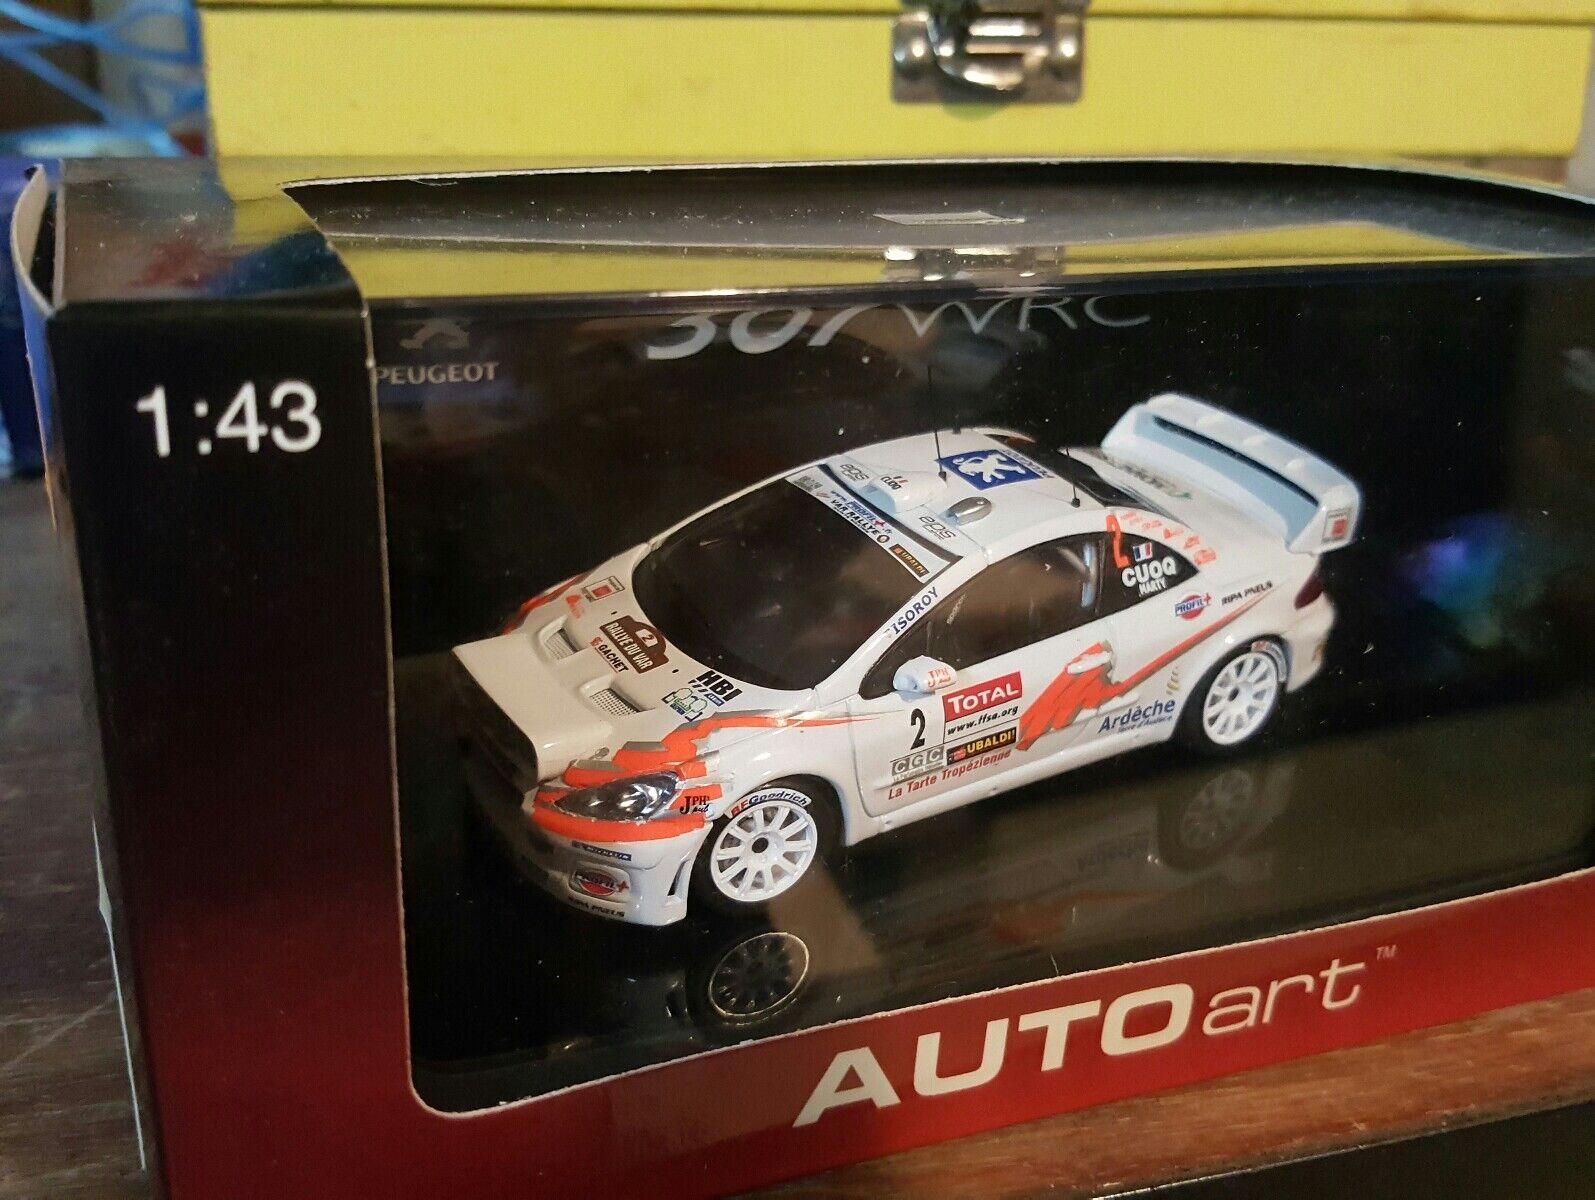 entrega de rayos Autoart Transkit Transkit Transkit 1 43 Peugeot 307 WRC  Ahorre hasta un 70% de descuento.